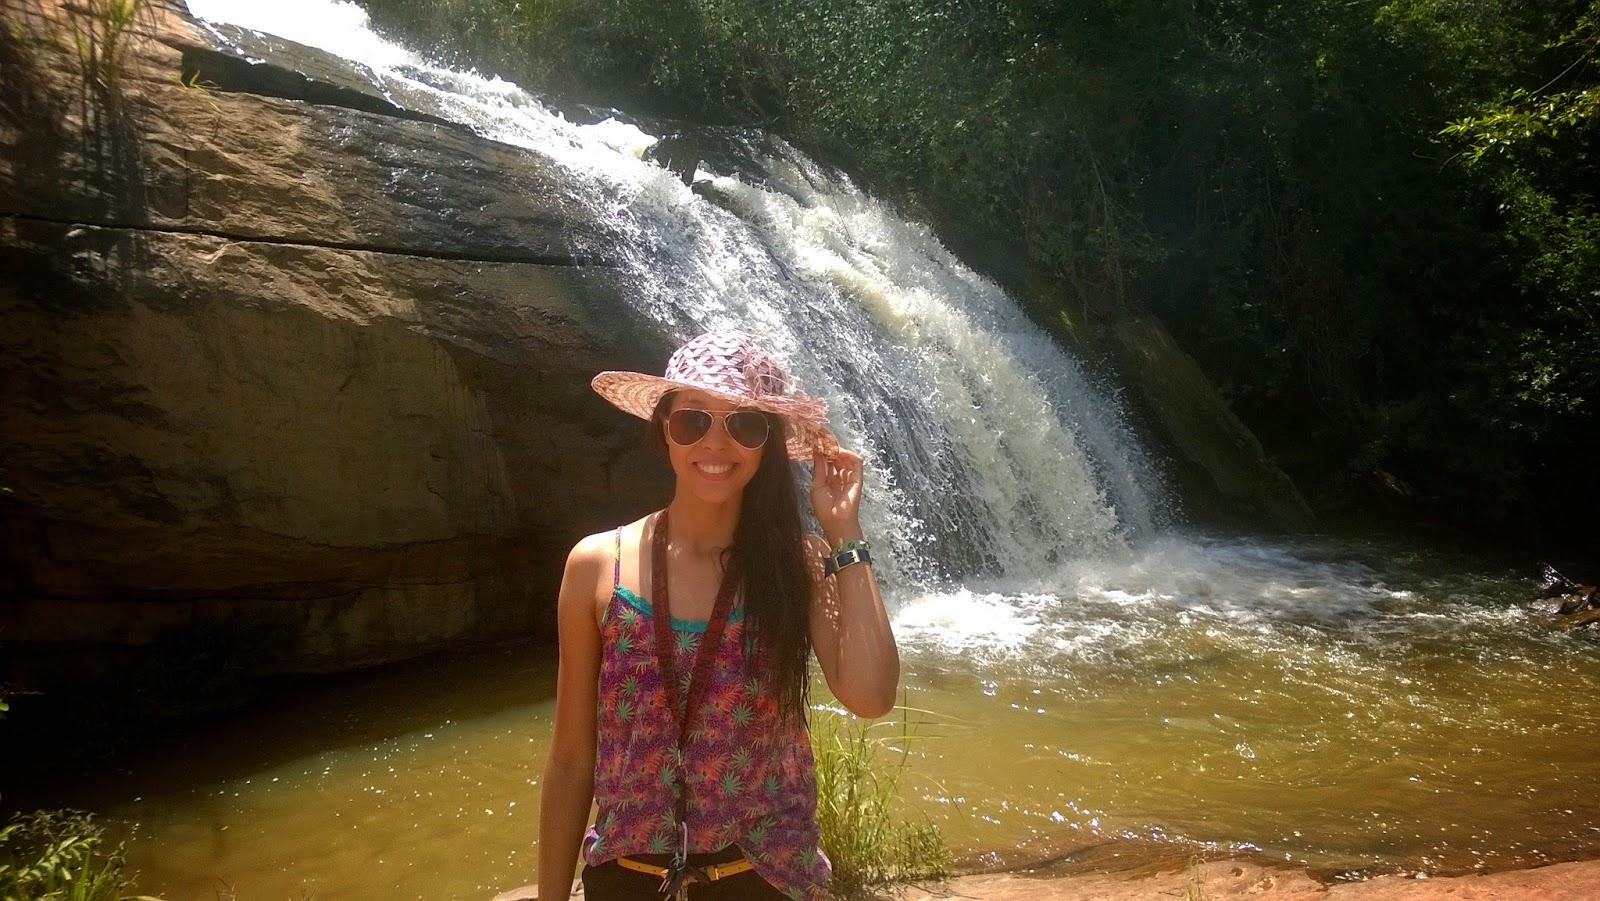 Passeio por Rio Manso